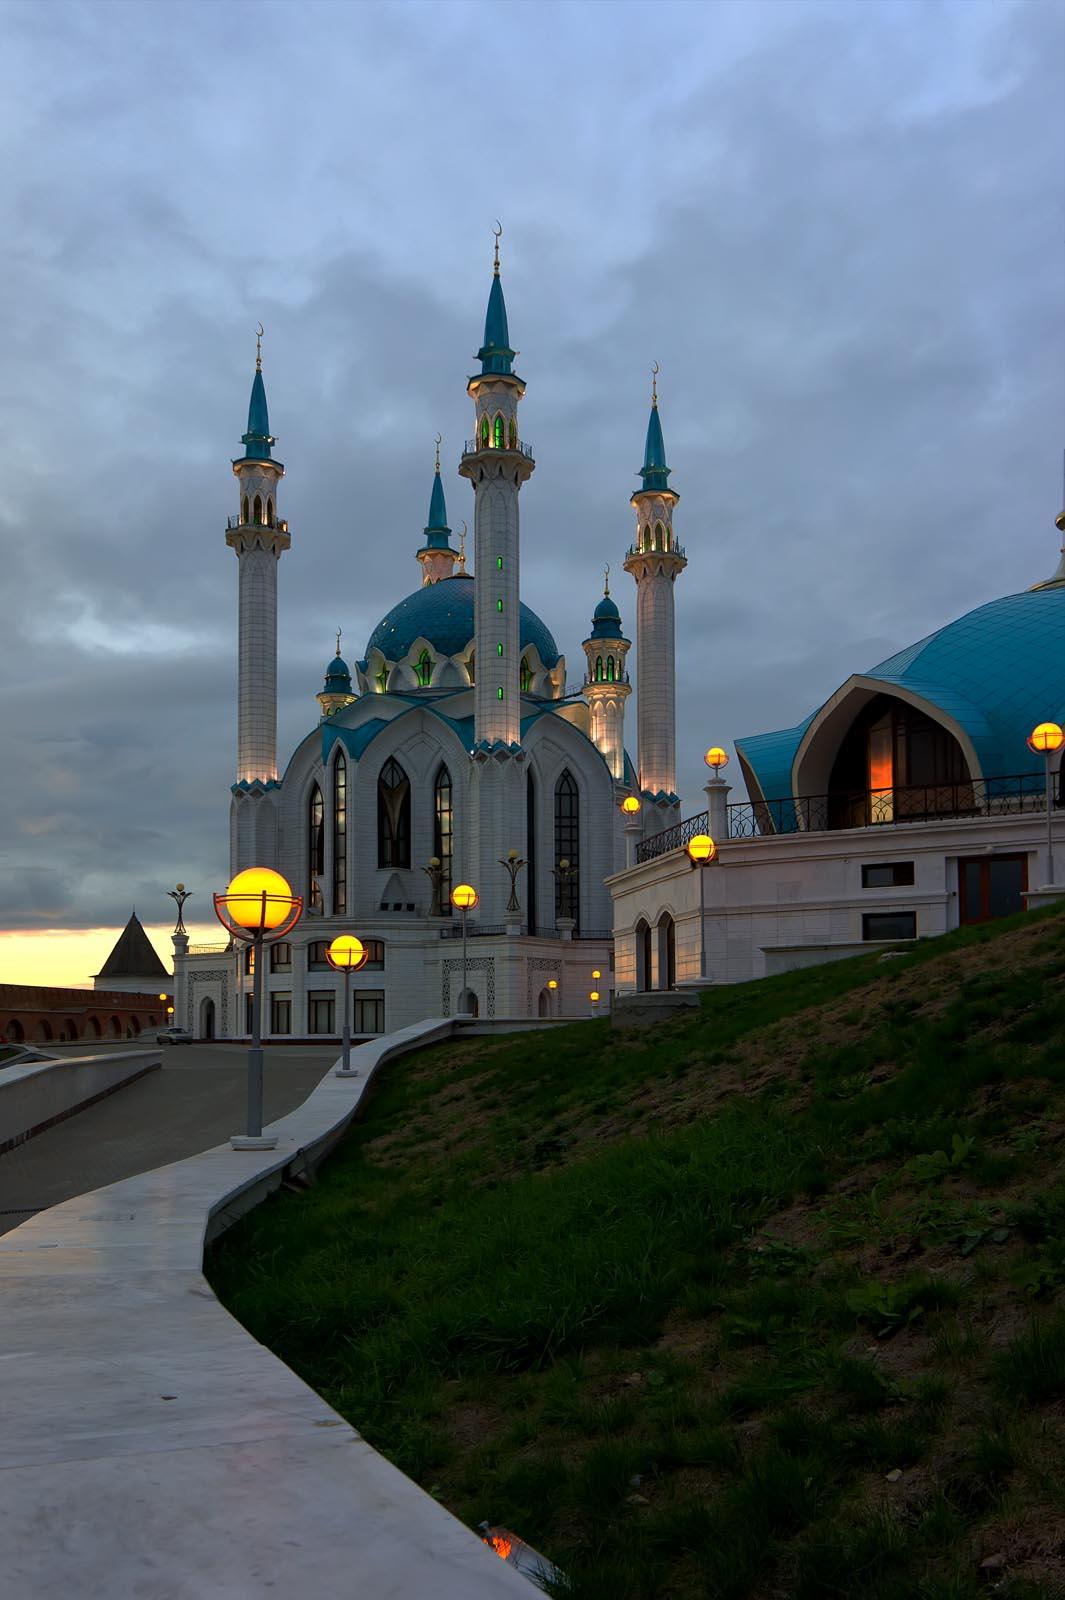 Фото №62552. Мечеть Кул Шариф